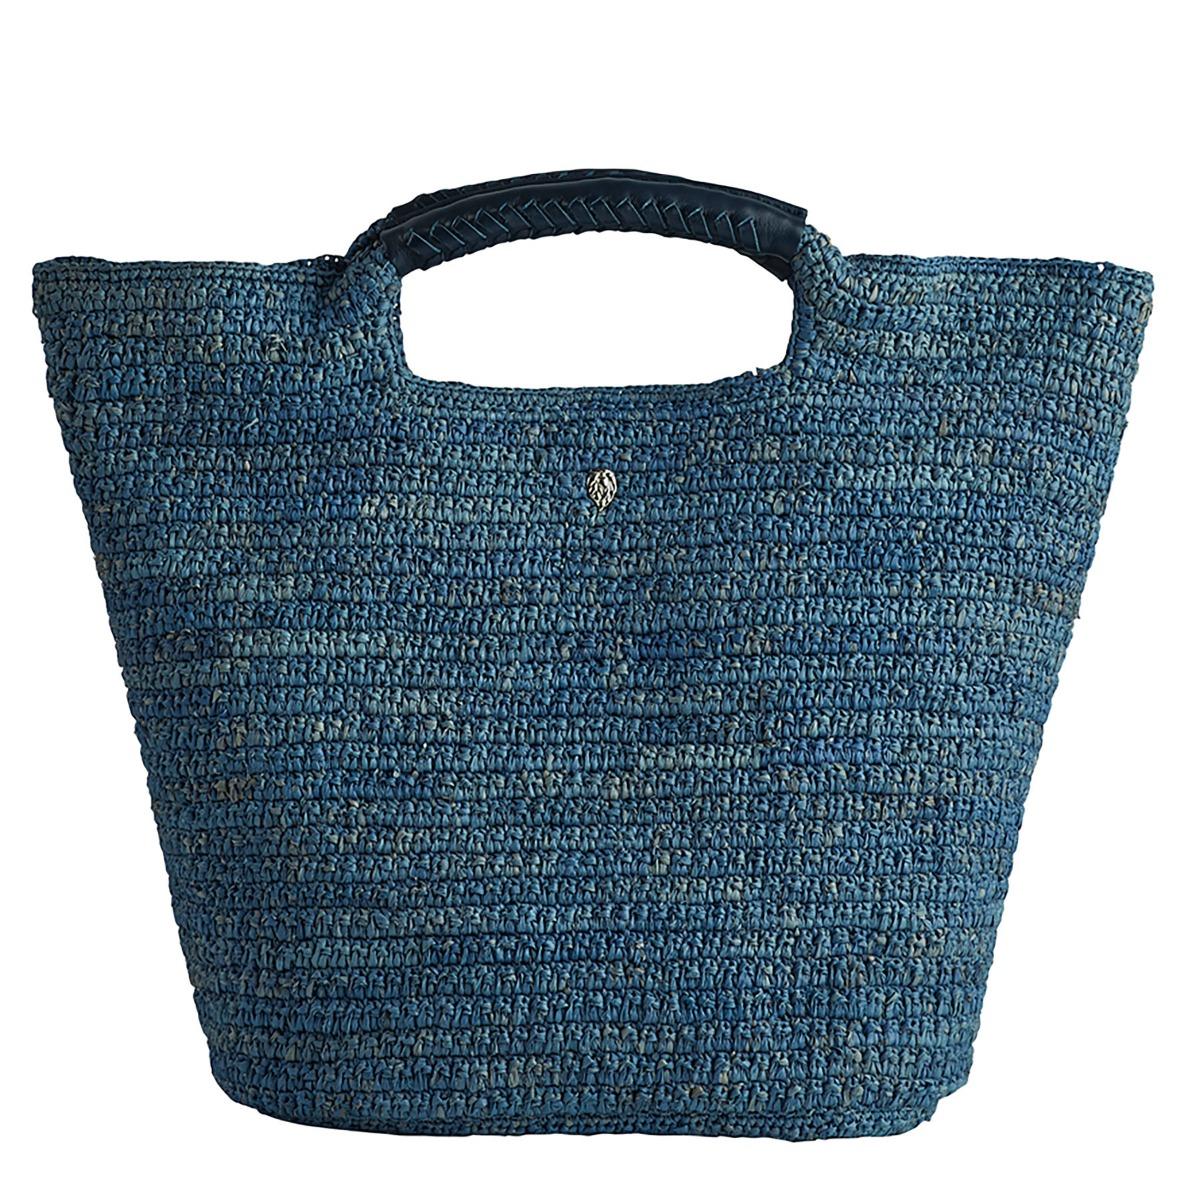 Helen Kaminski Petani Small Basket Bag in Glacial,Baltic